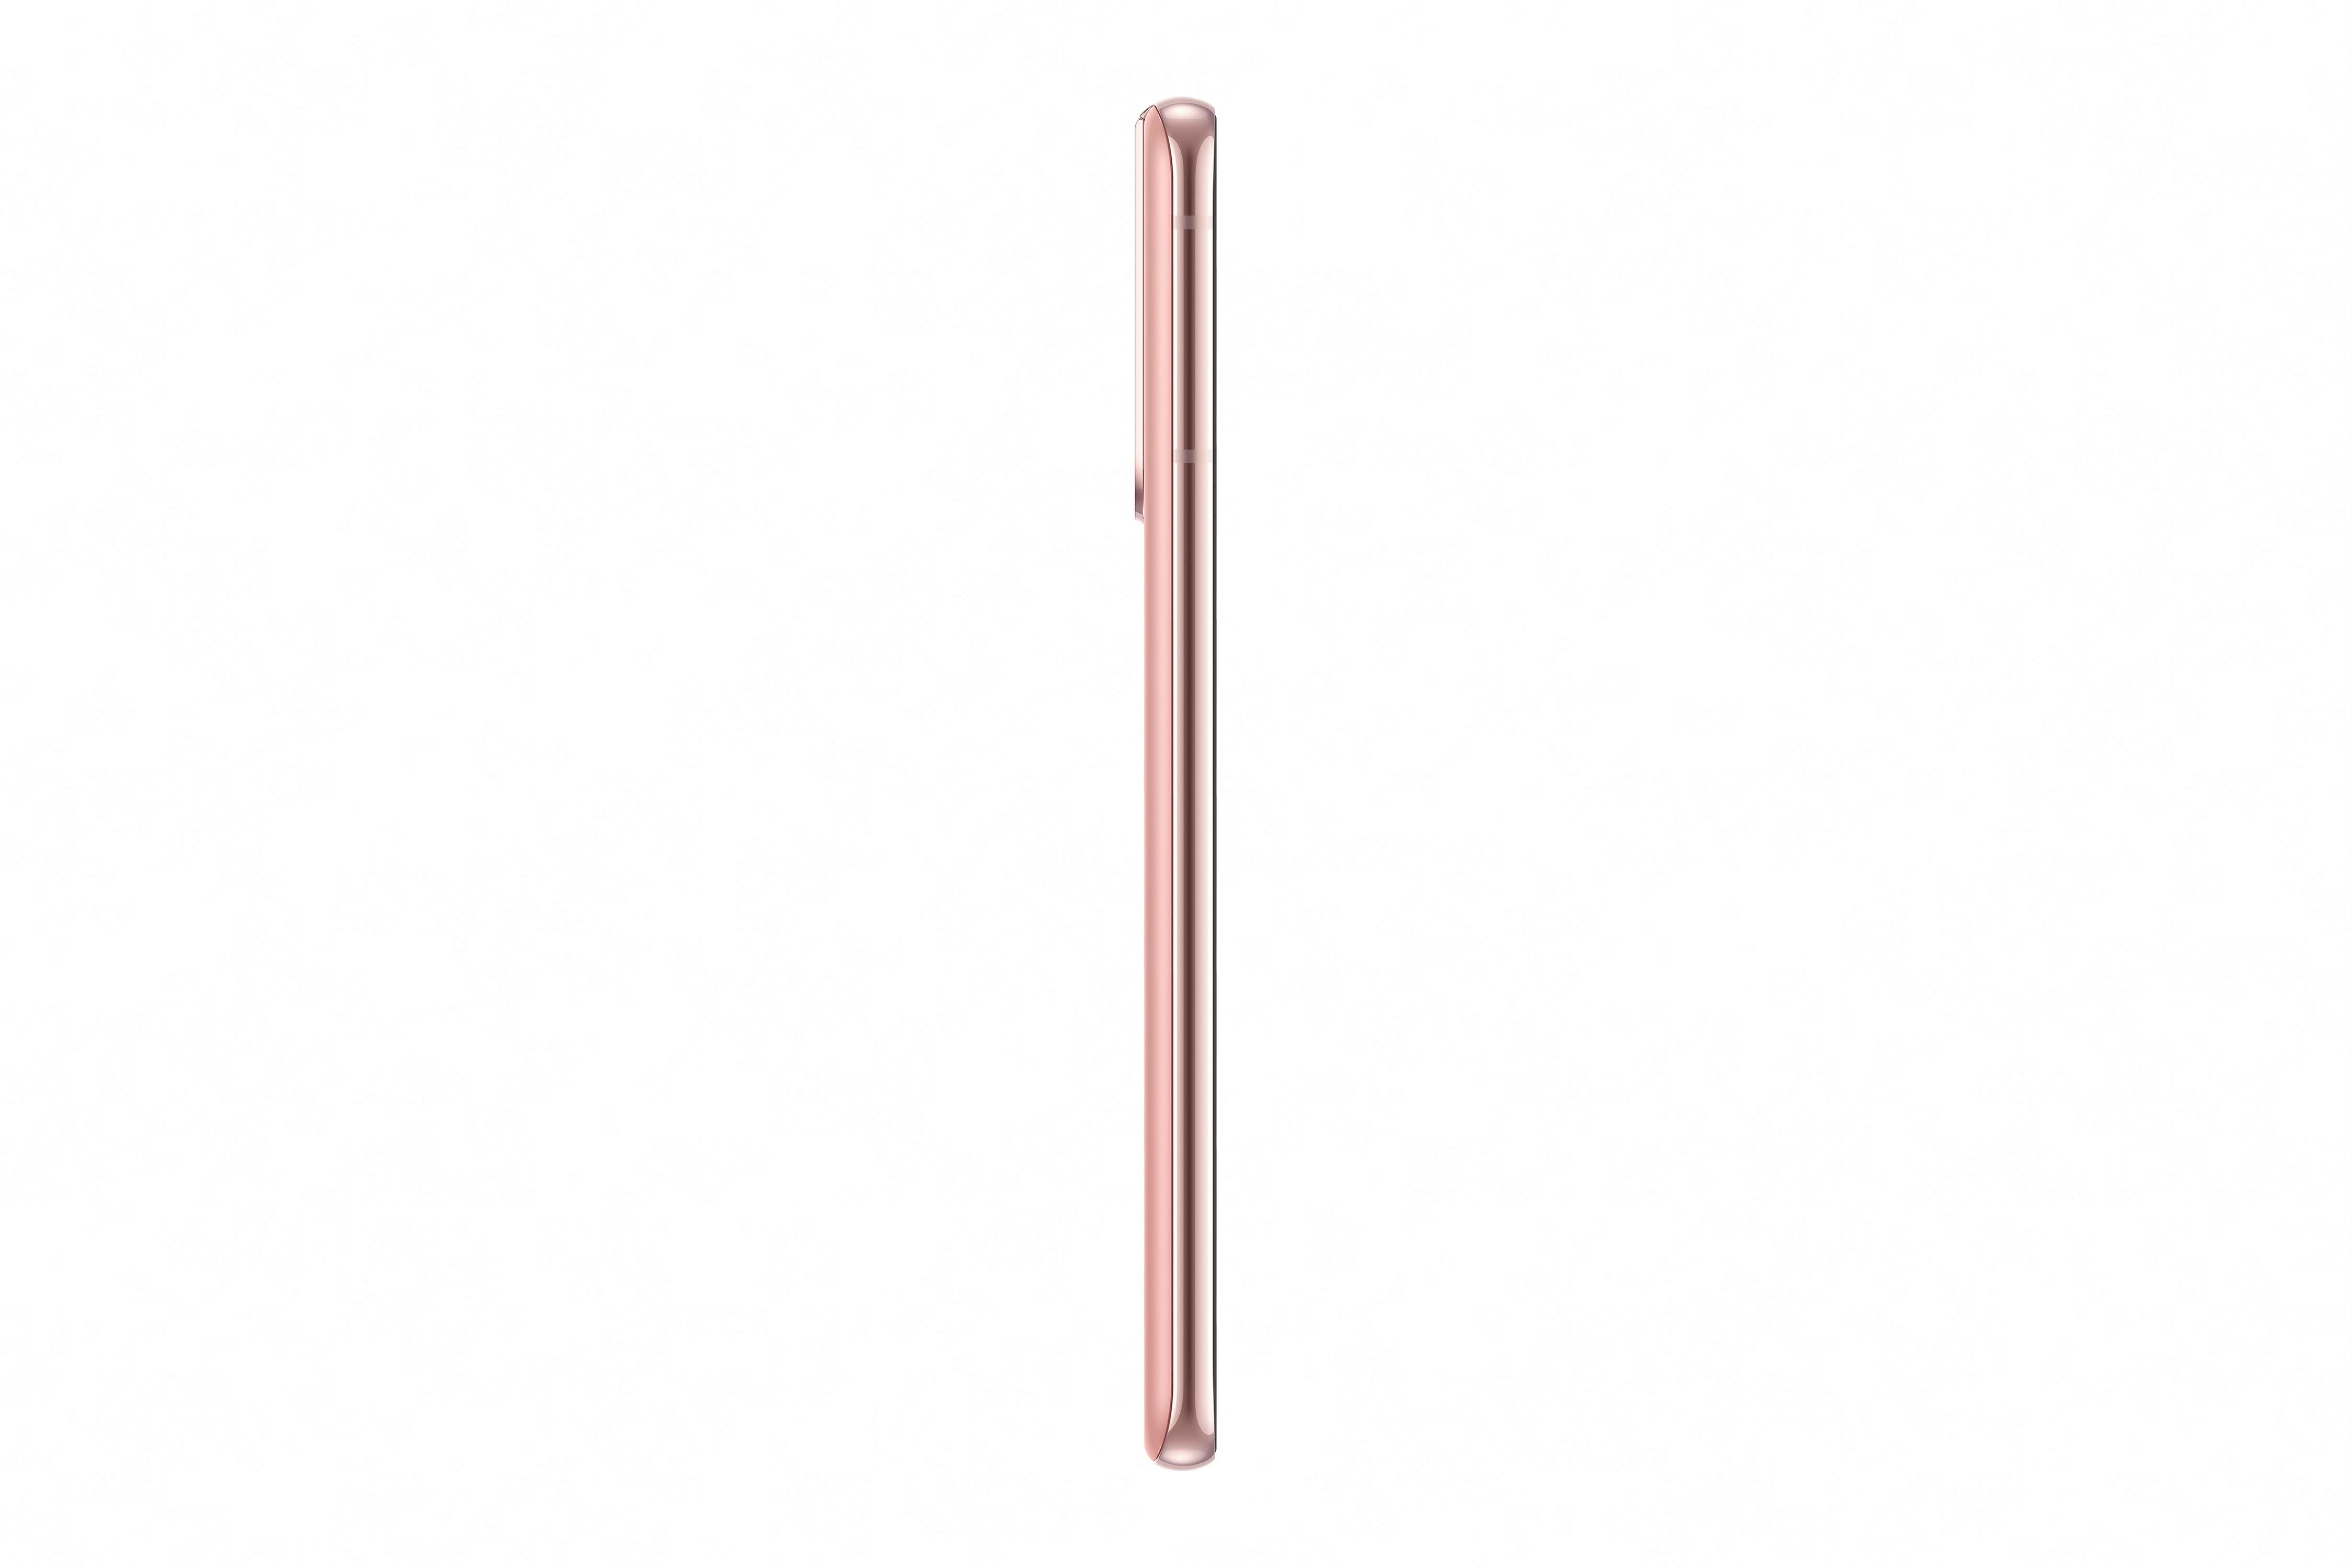 Samsung Galaxy S21 DUAL (SM-G991B) Pink - 5